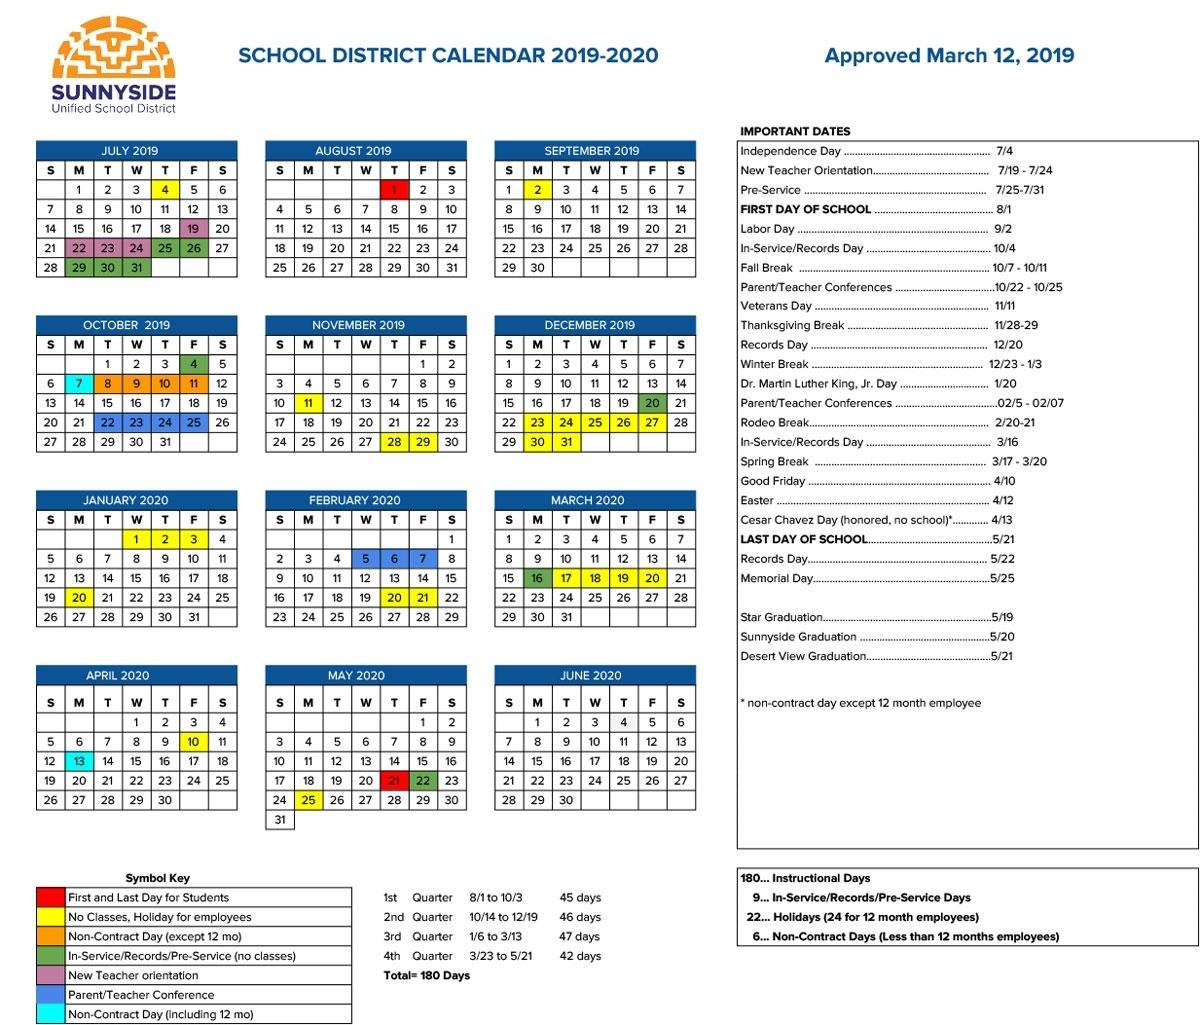 Special Days In The School Year 2019-2020 - Calendar